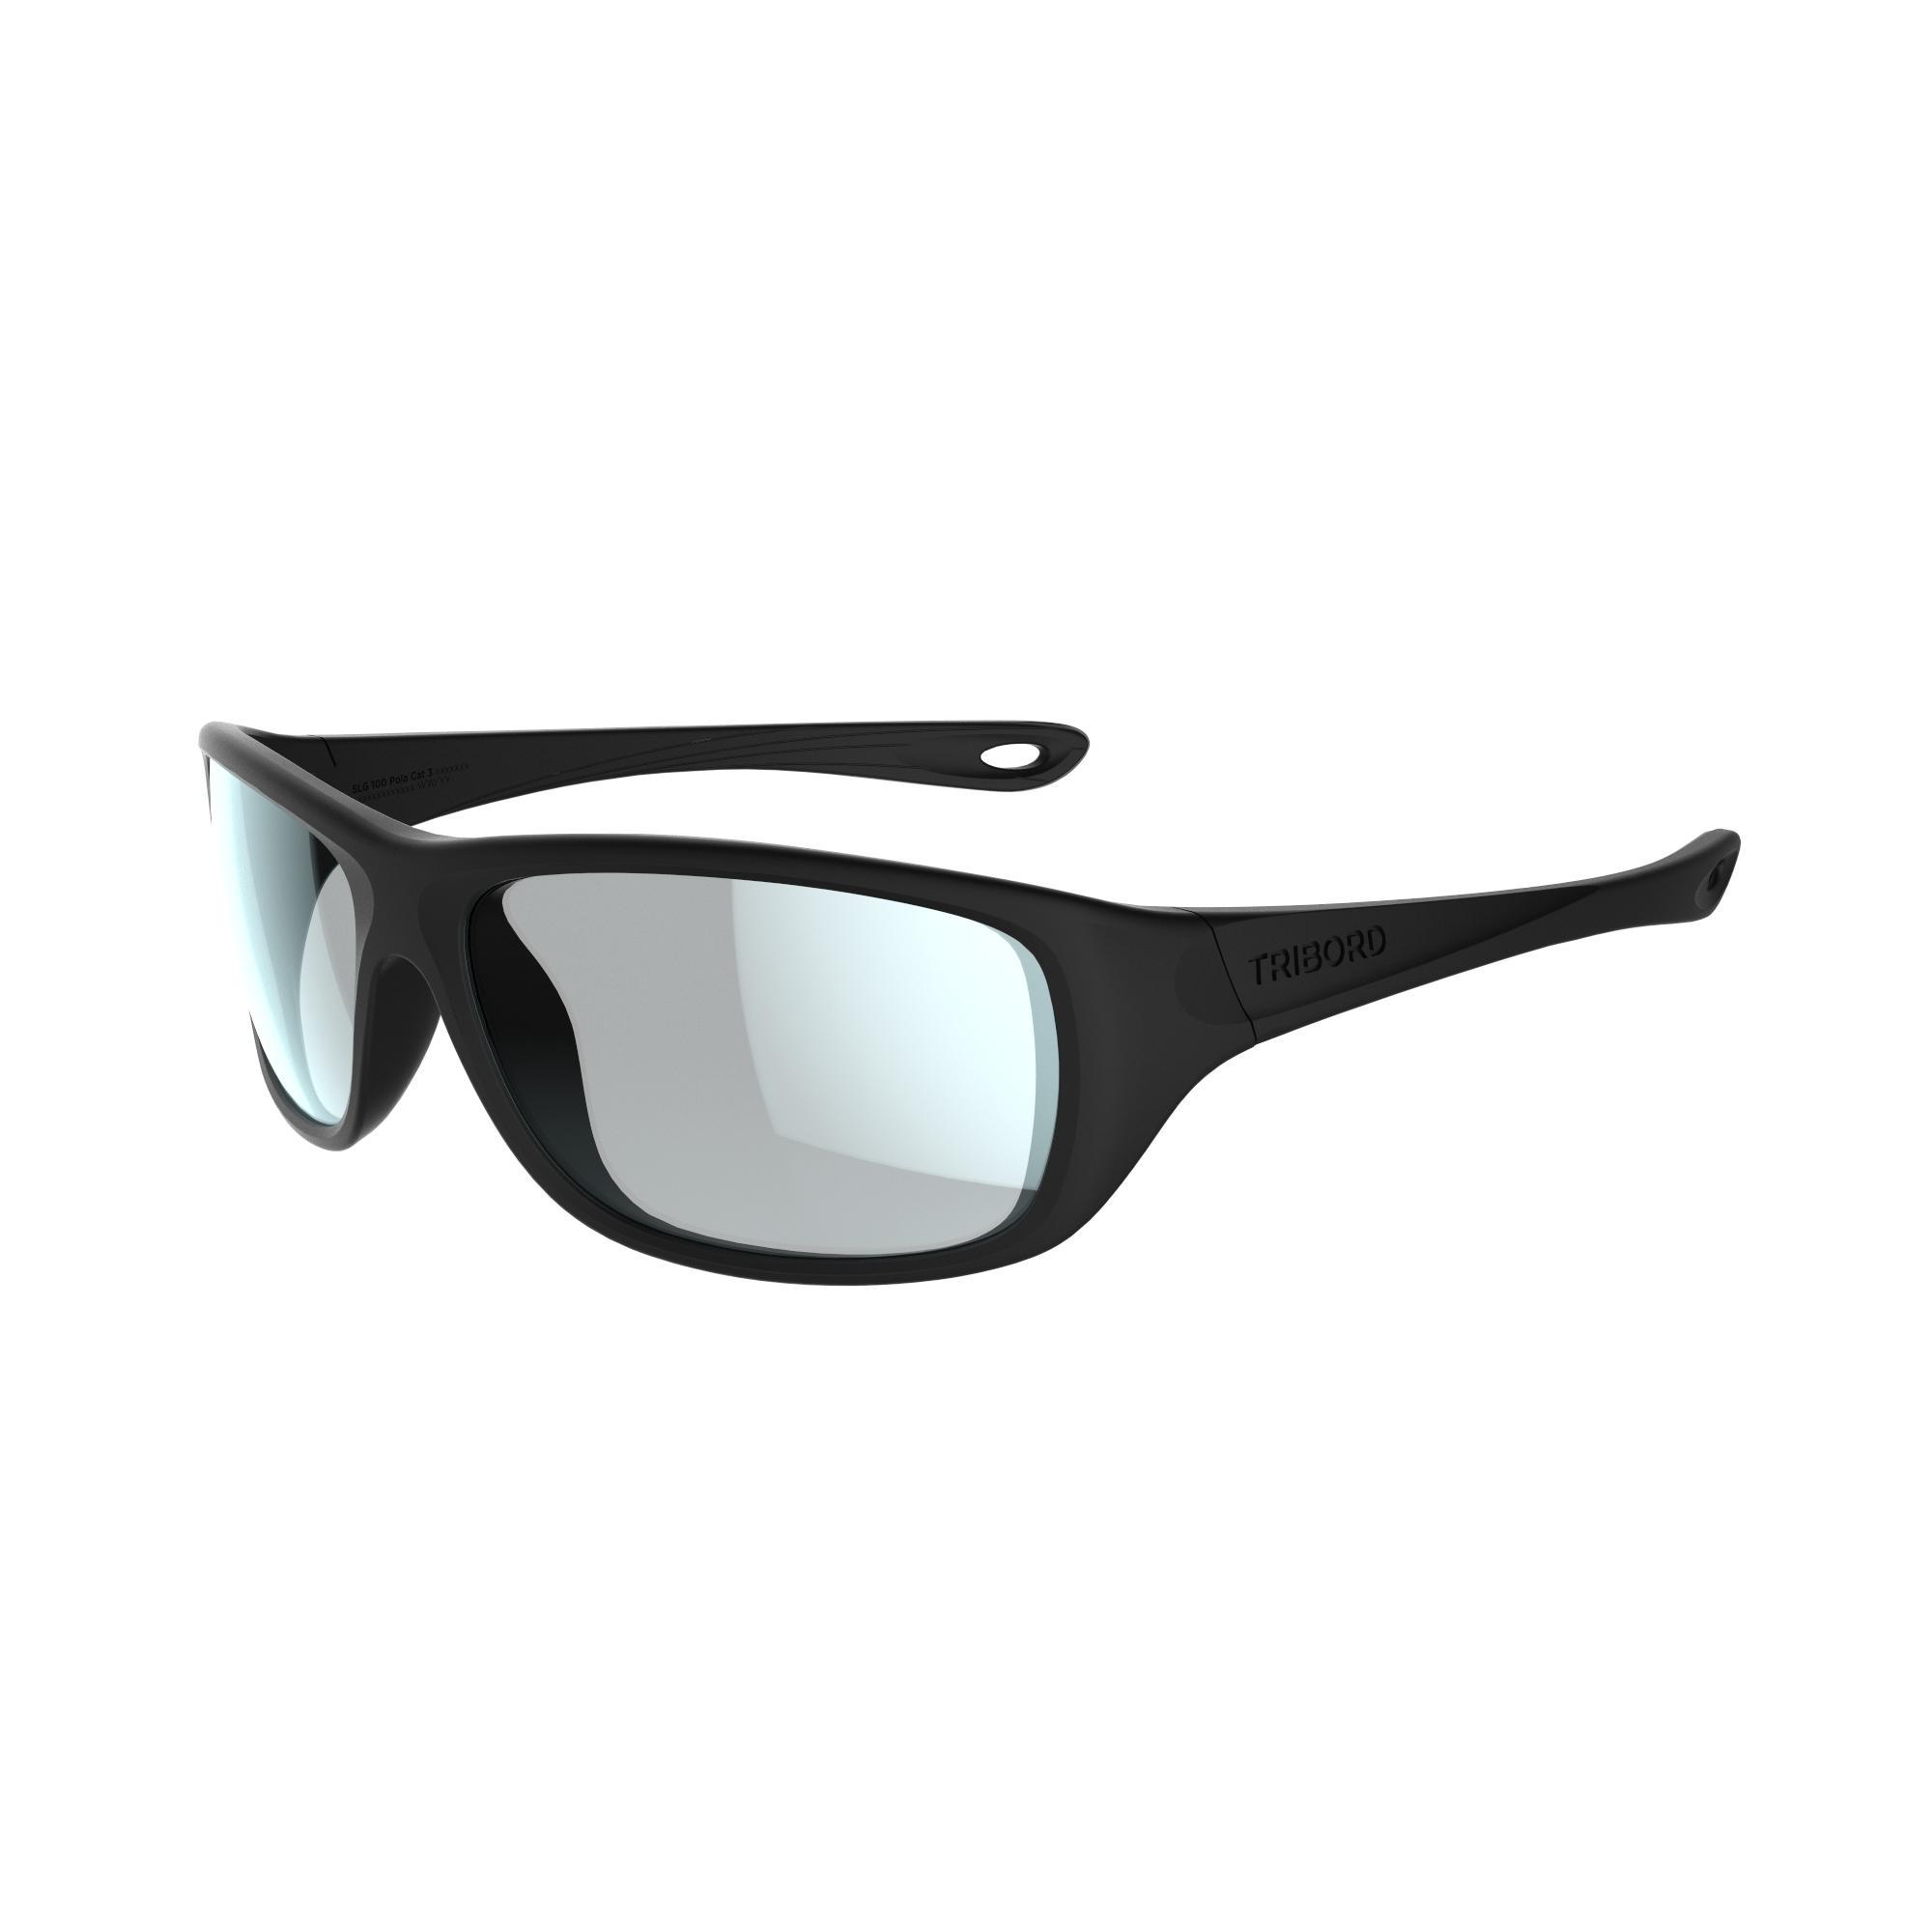 Tribord Watersportbril 300 voor volwassenen, zwart, drijvend, polariserend categorie 3